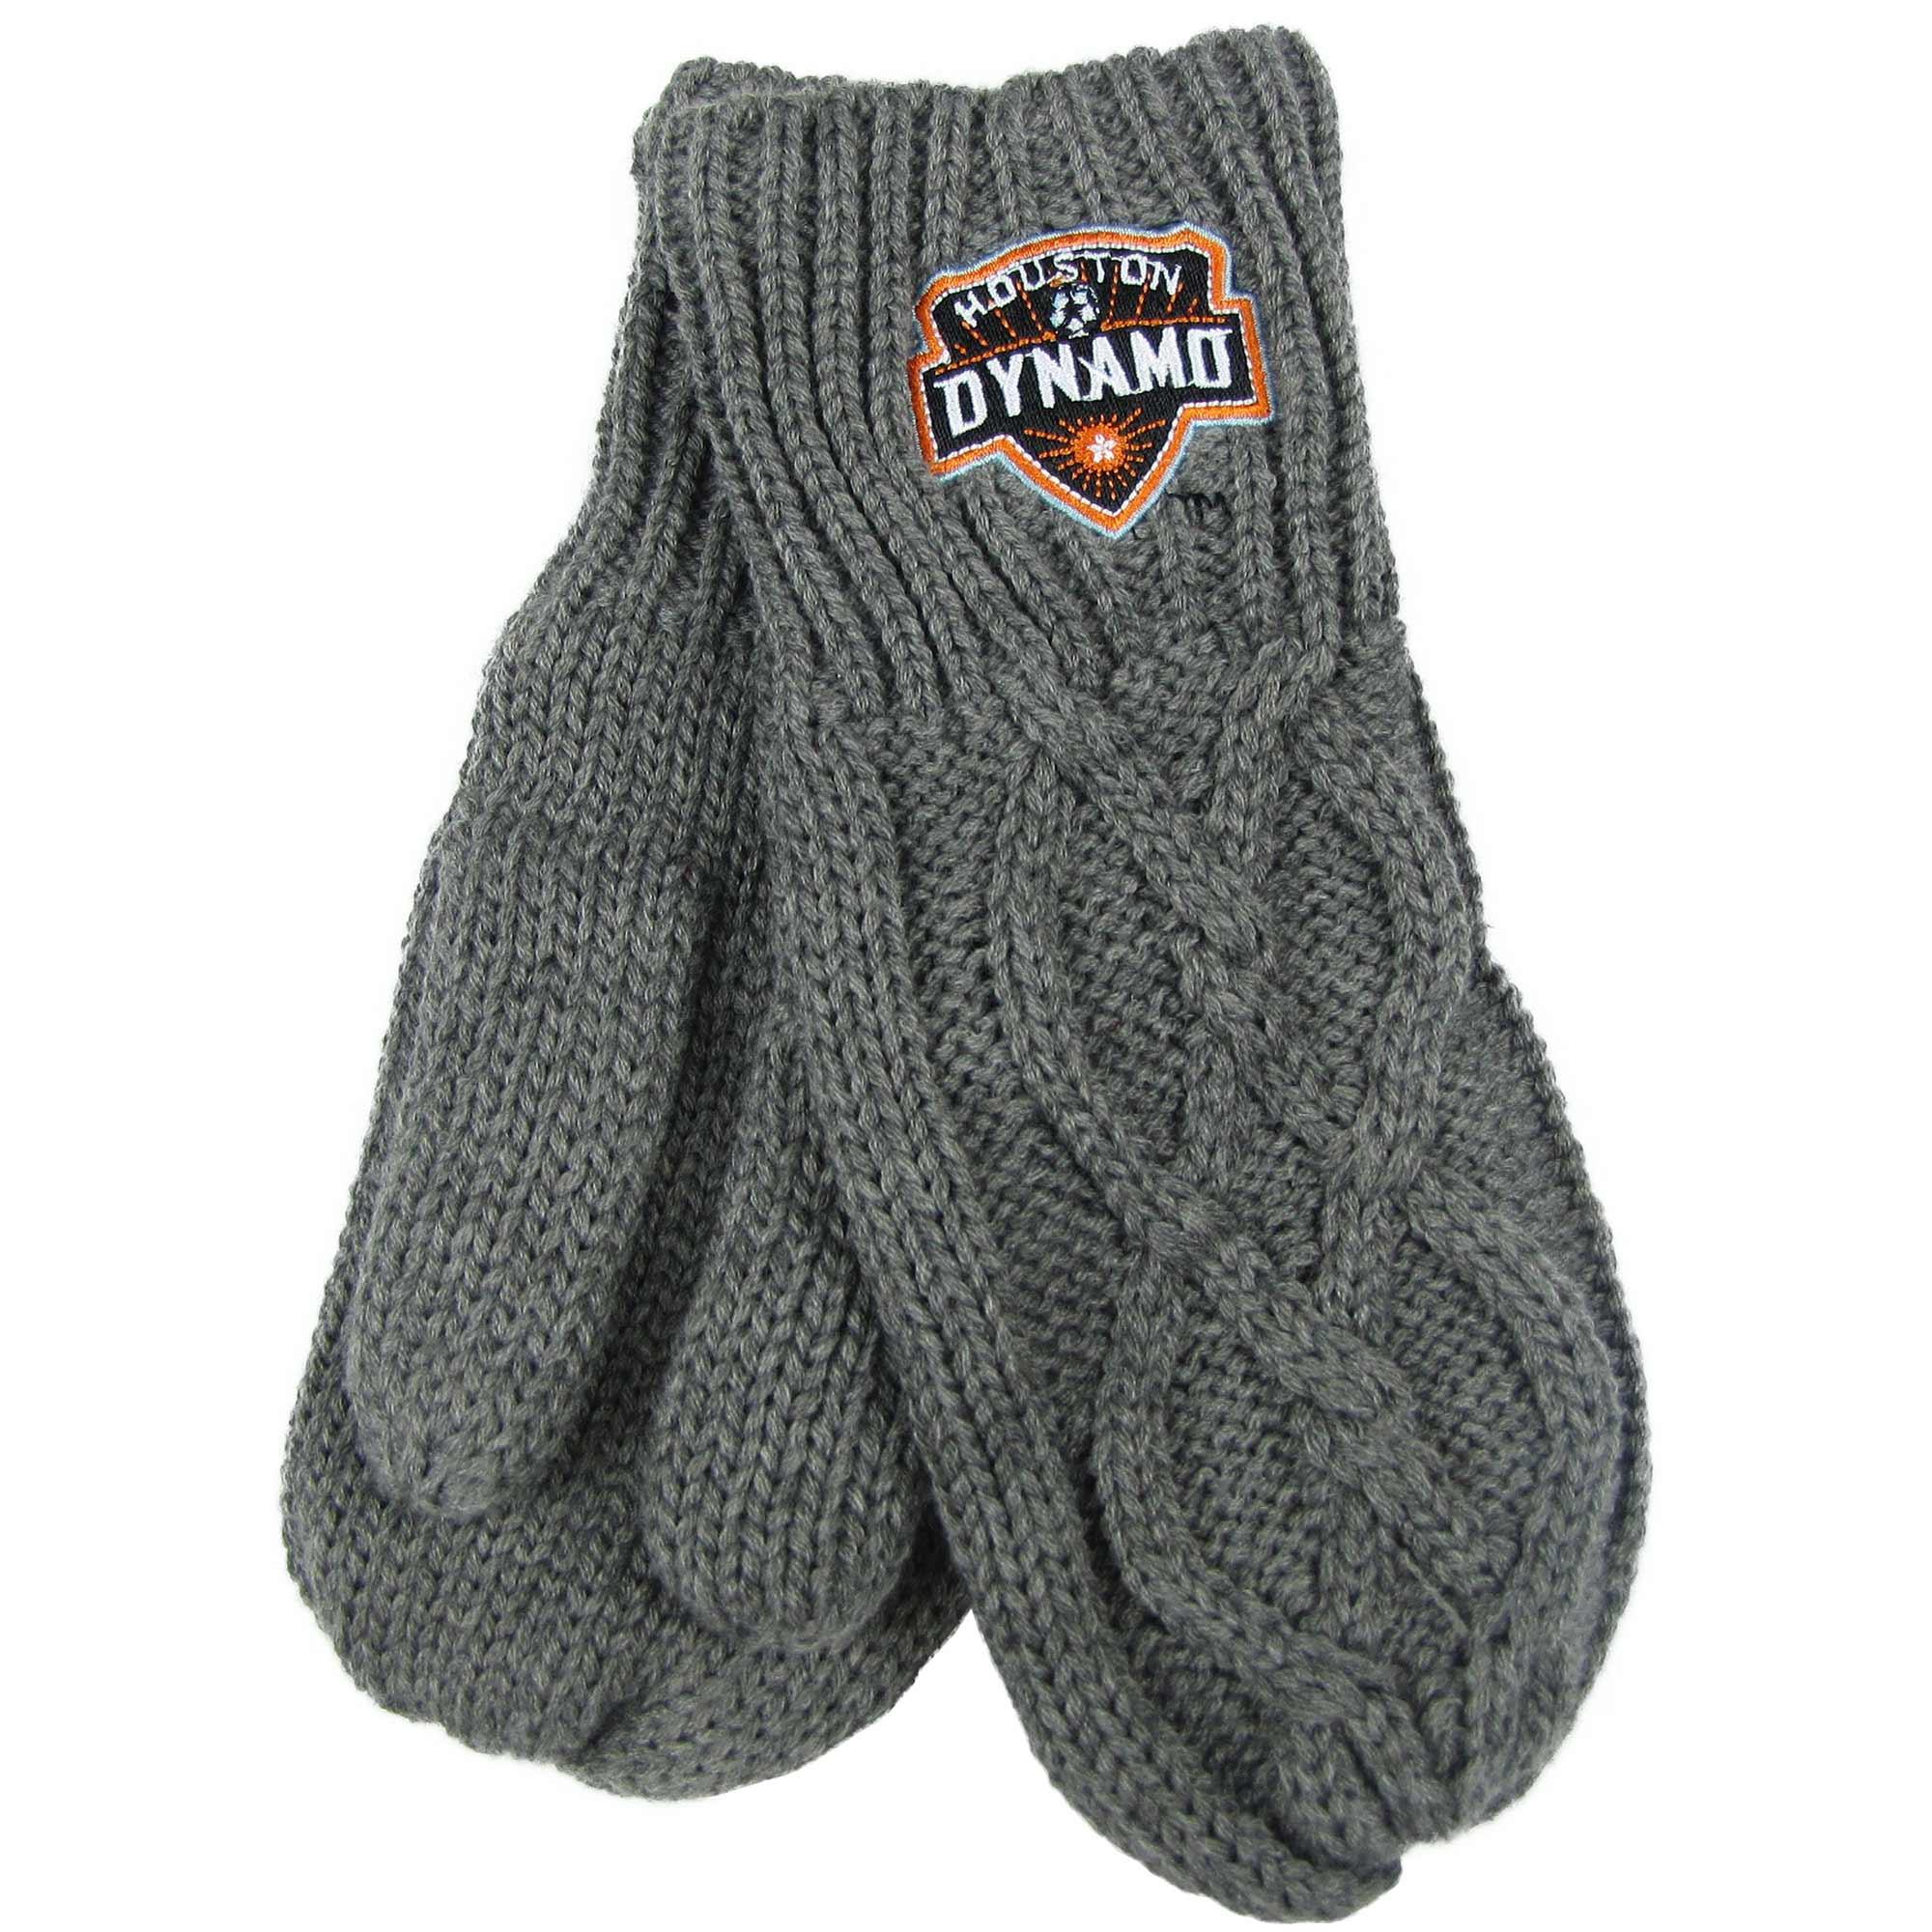 Houston Dynamo ZooZatz Women's Cable Knit Mittens - Charcoal - No Size